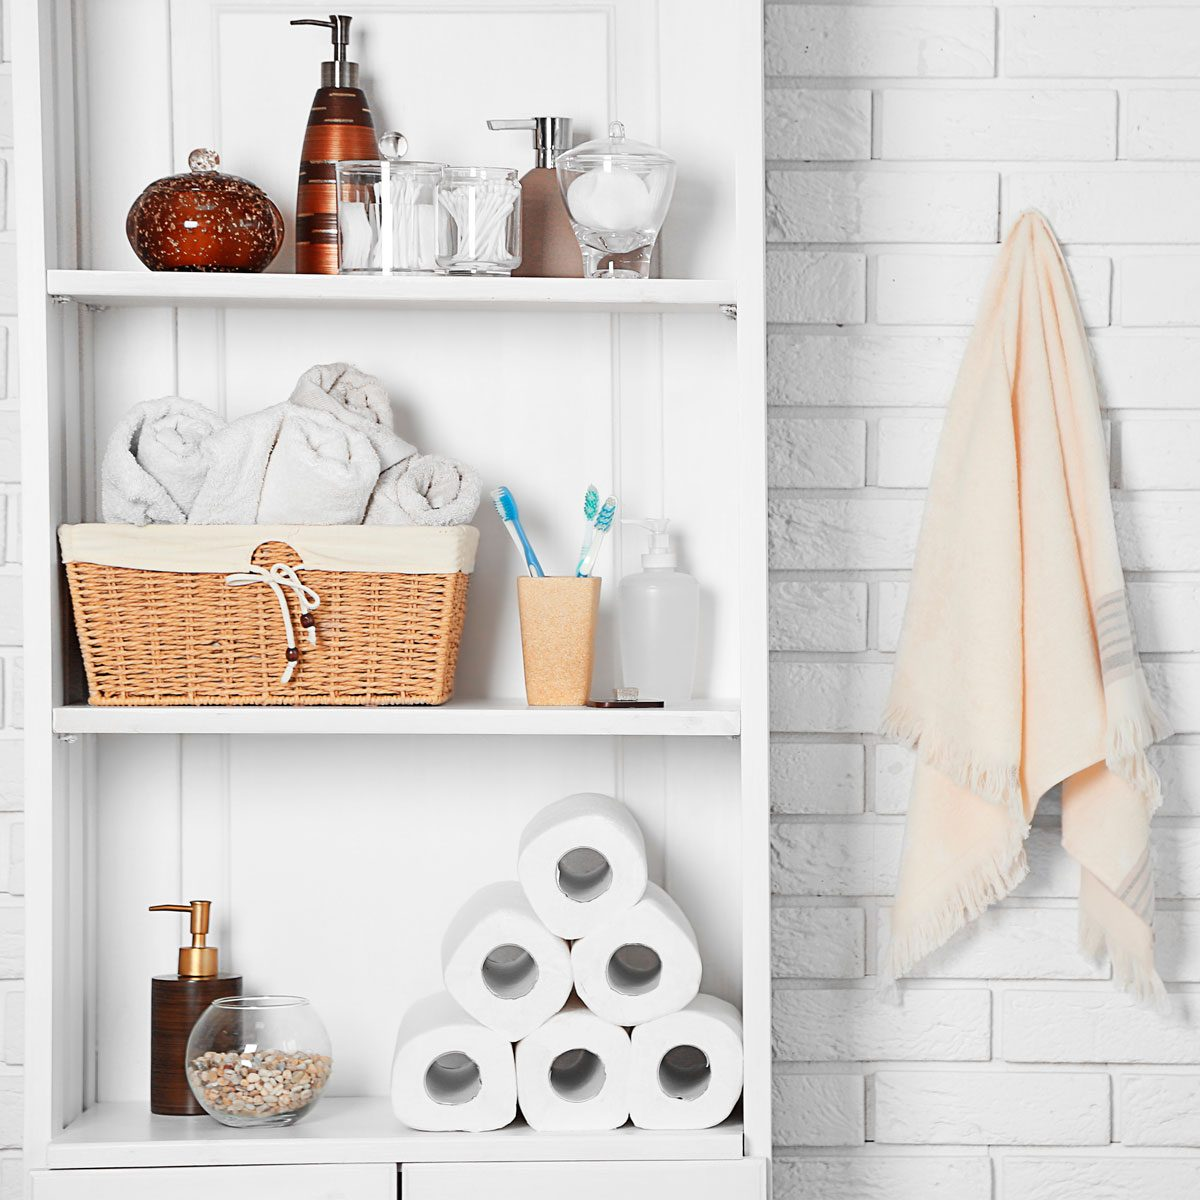 10 Small Bathroom Ideas That Make A Big Impact Family Handyman